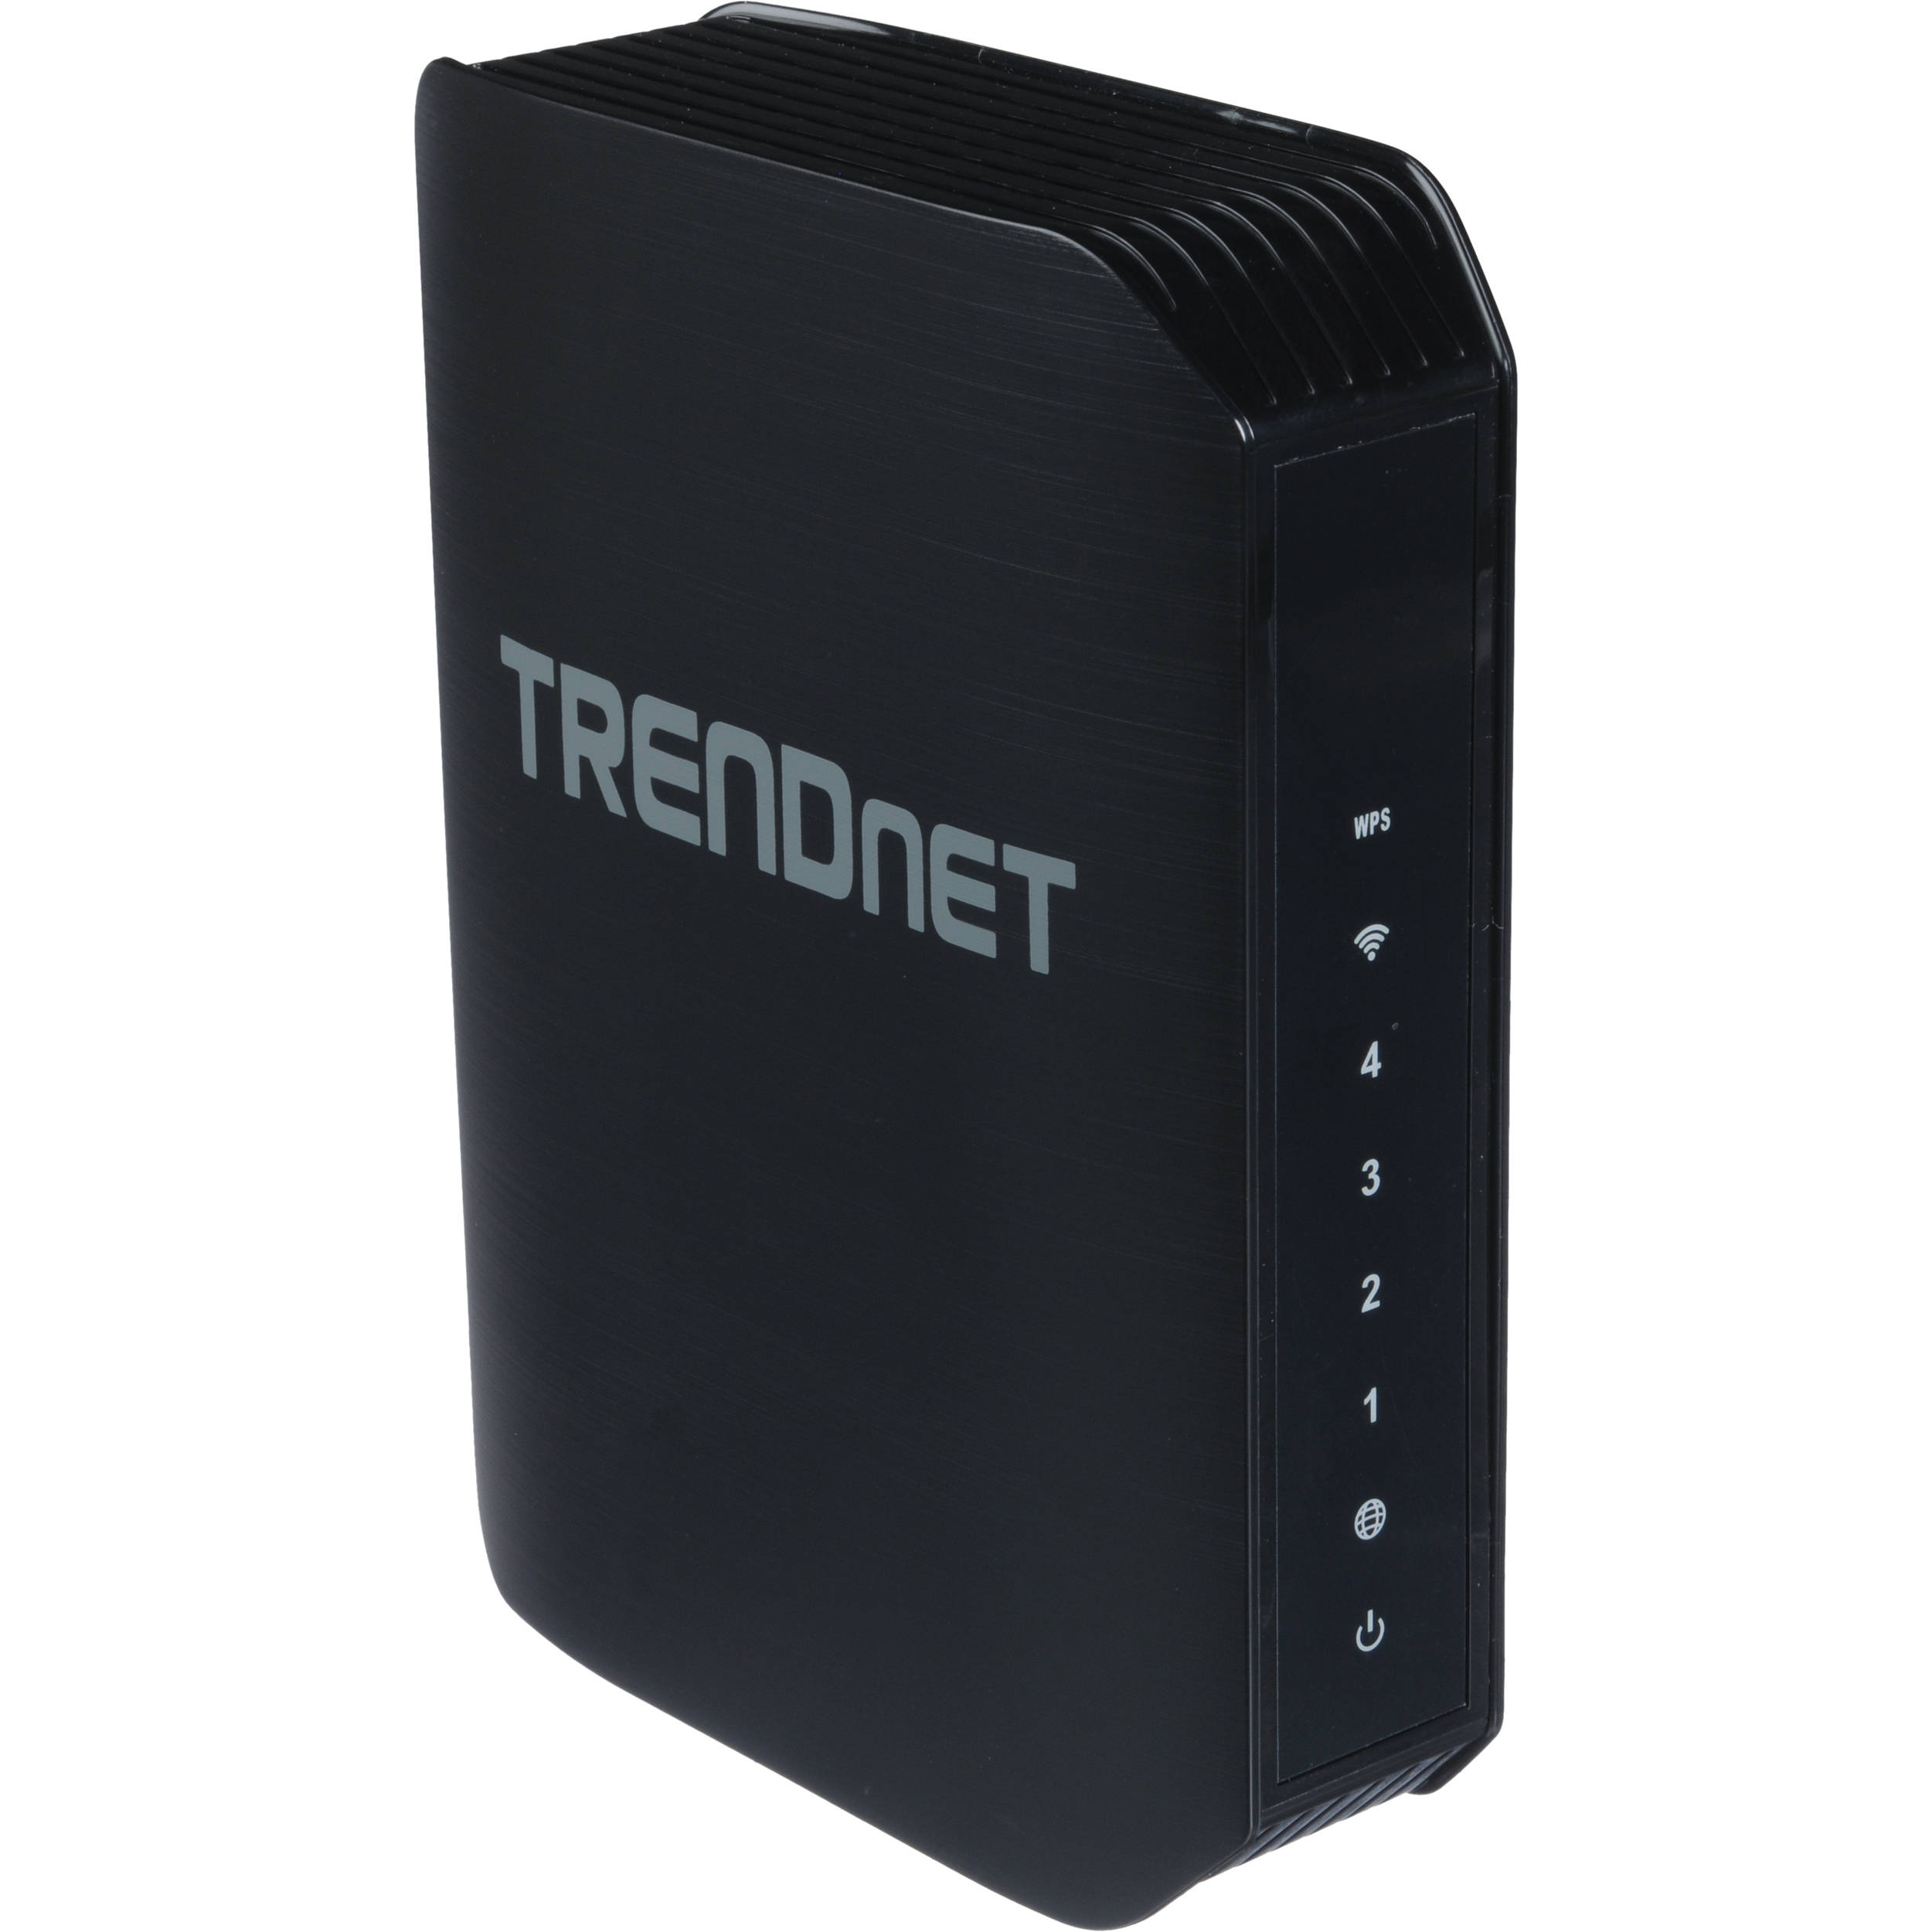 TRENDnet TEW-751DR Router Windows 7